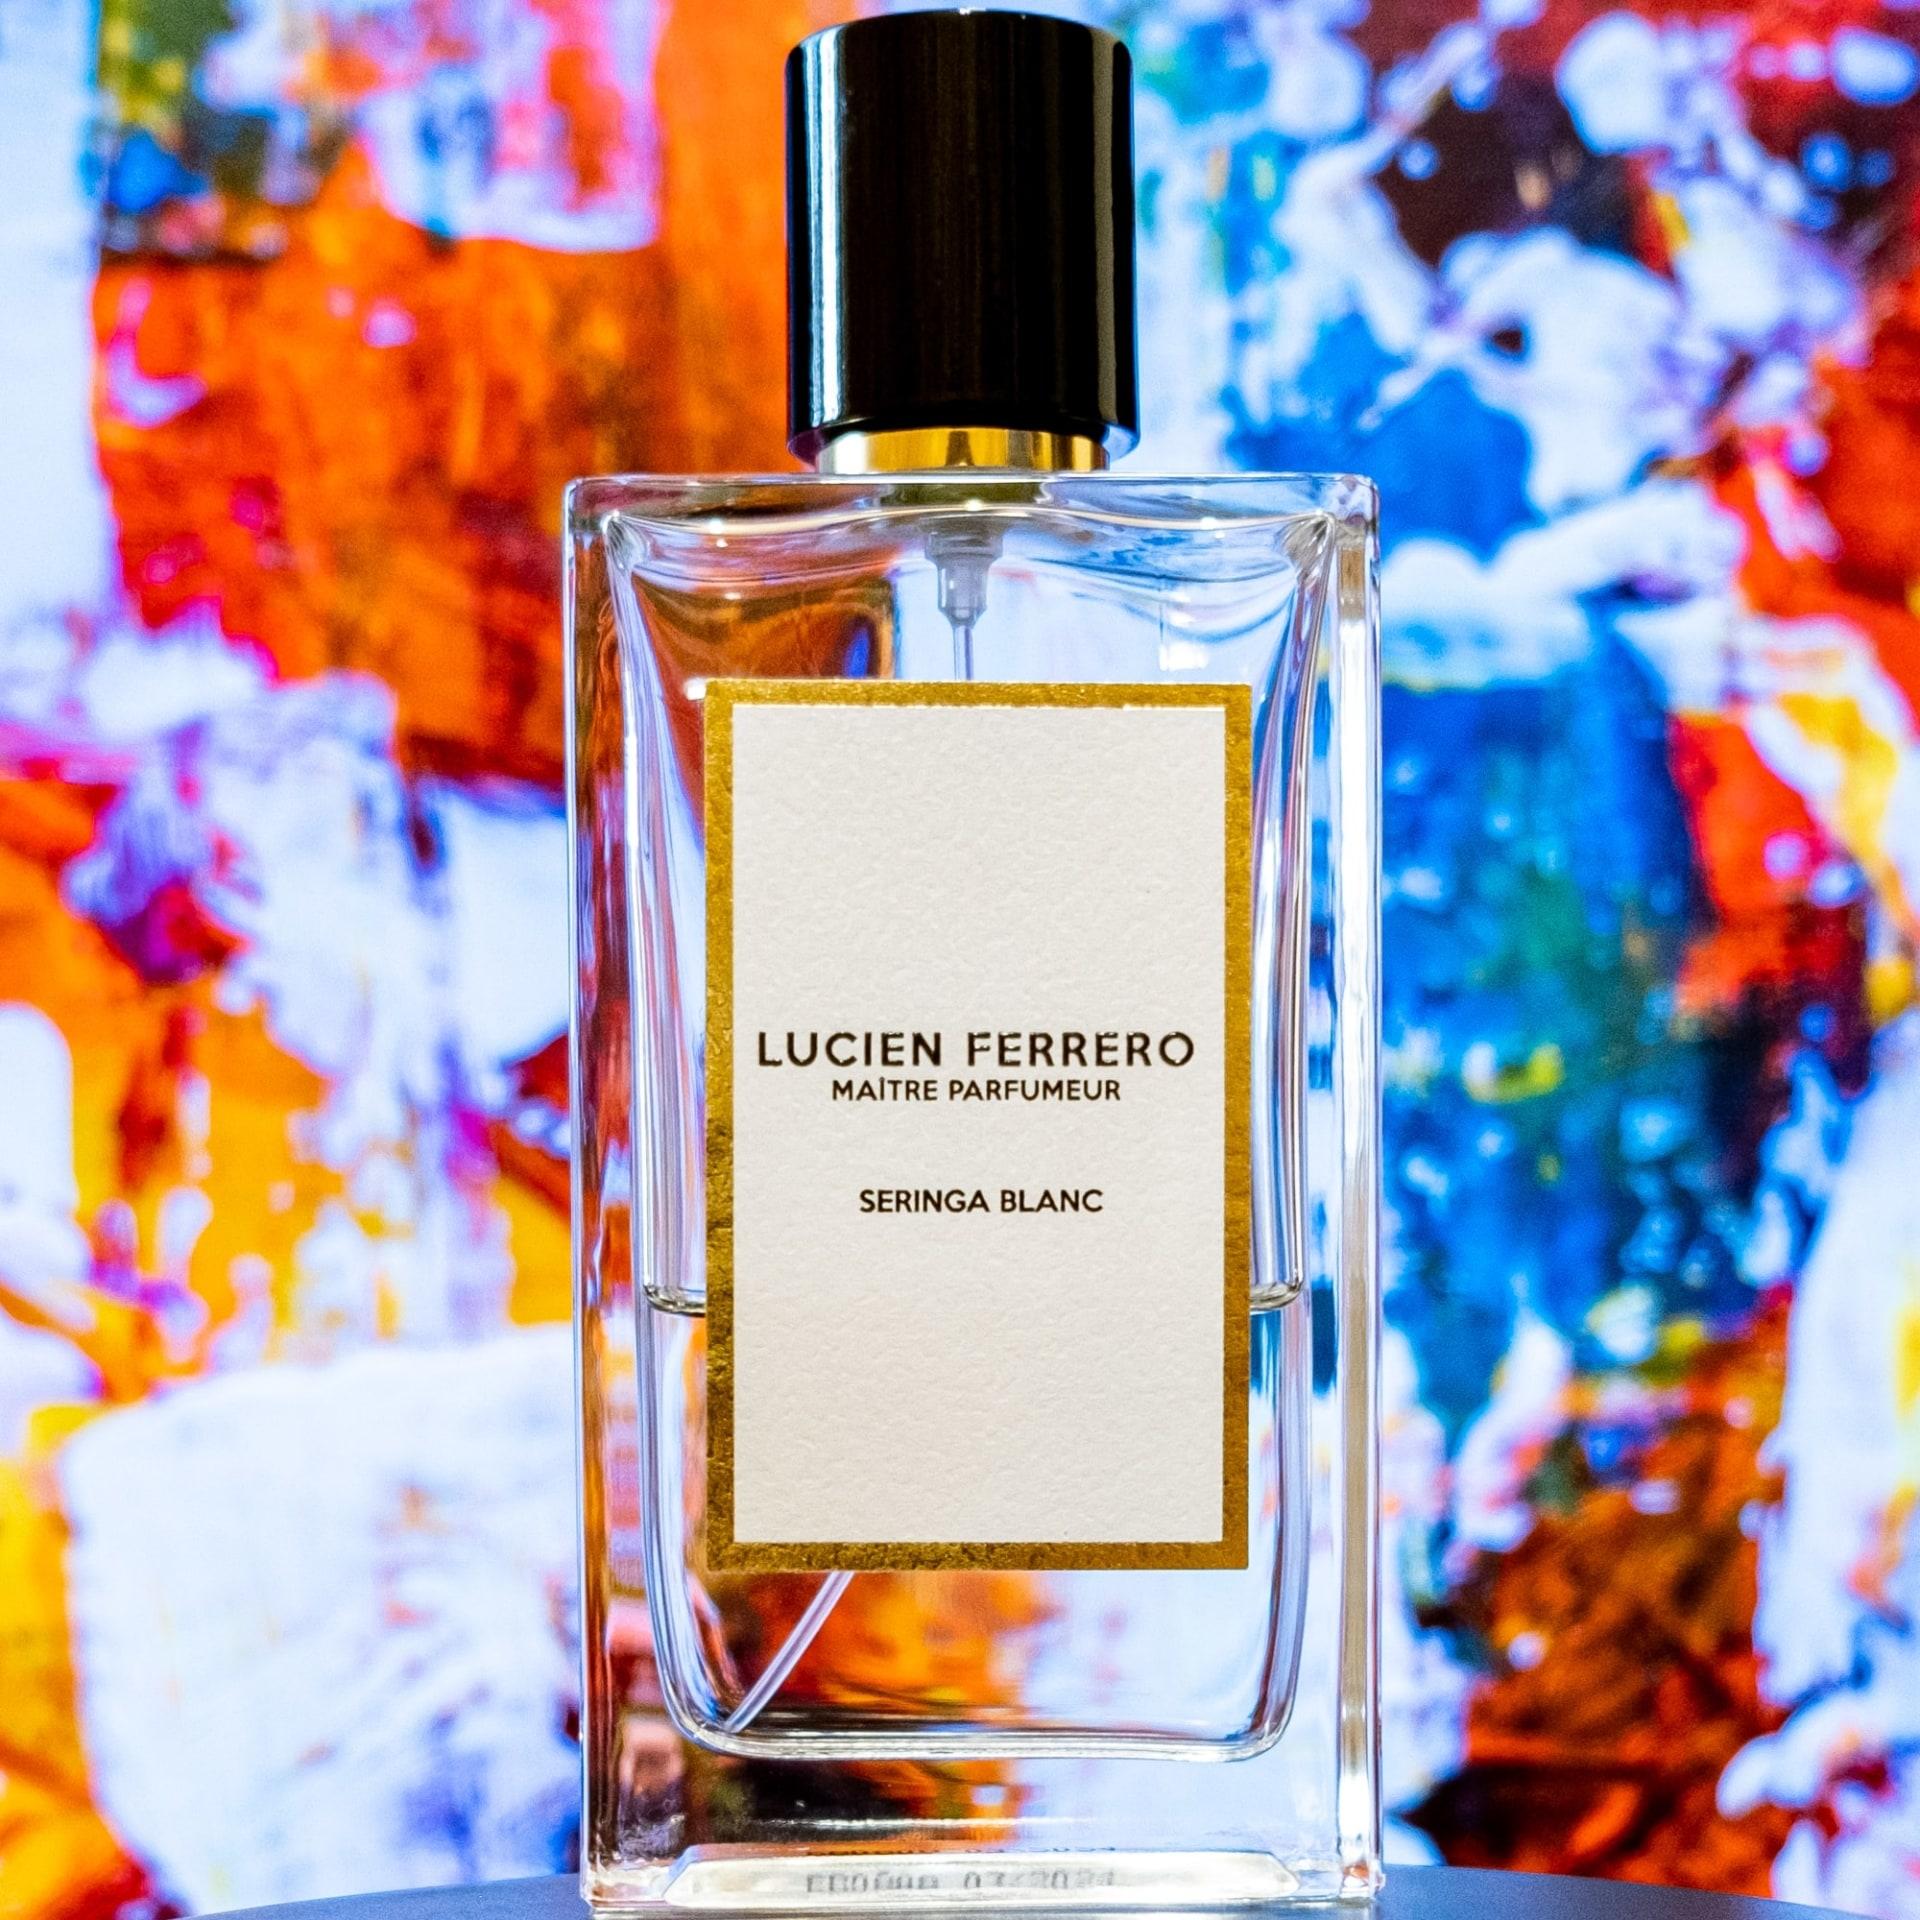 lucien-ferrero-maitre-parfumeur-seringa-blanc